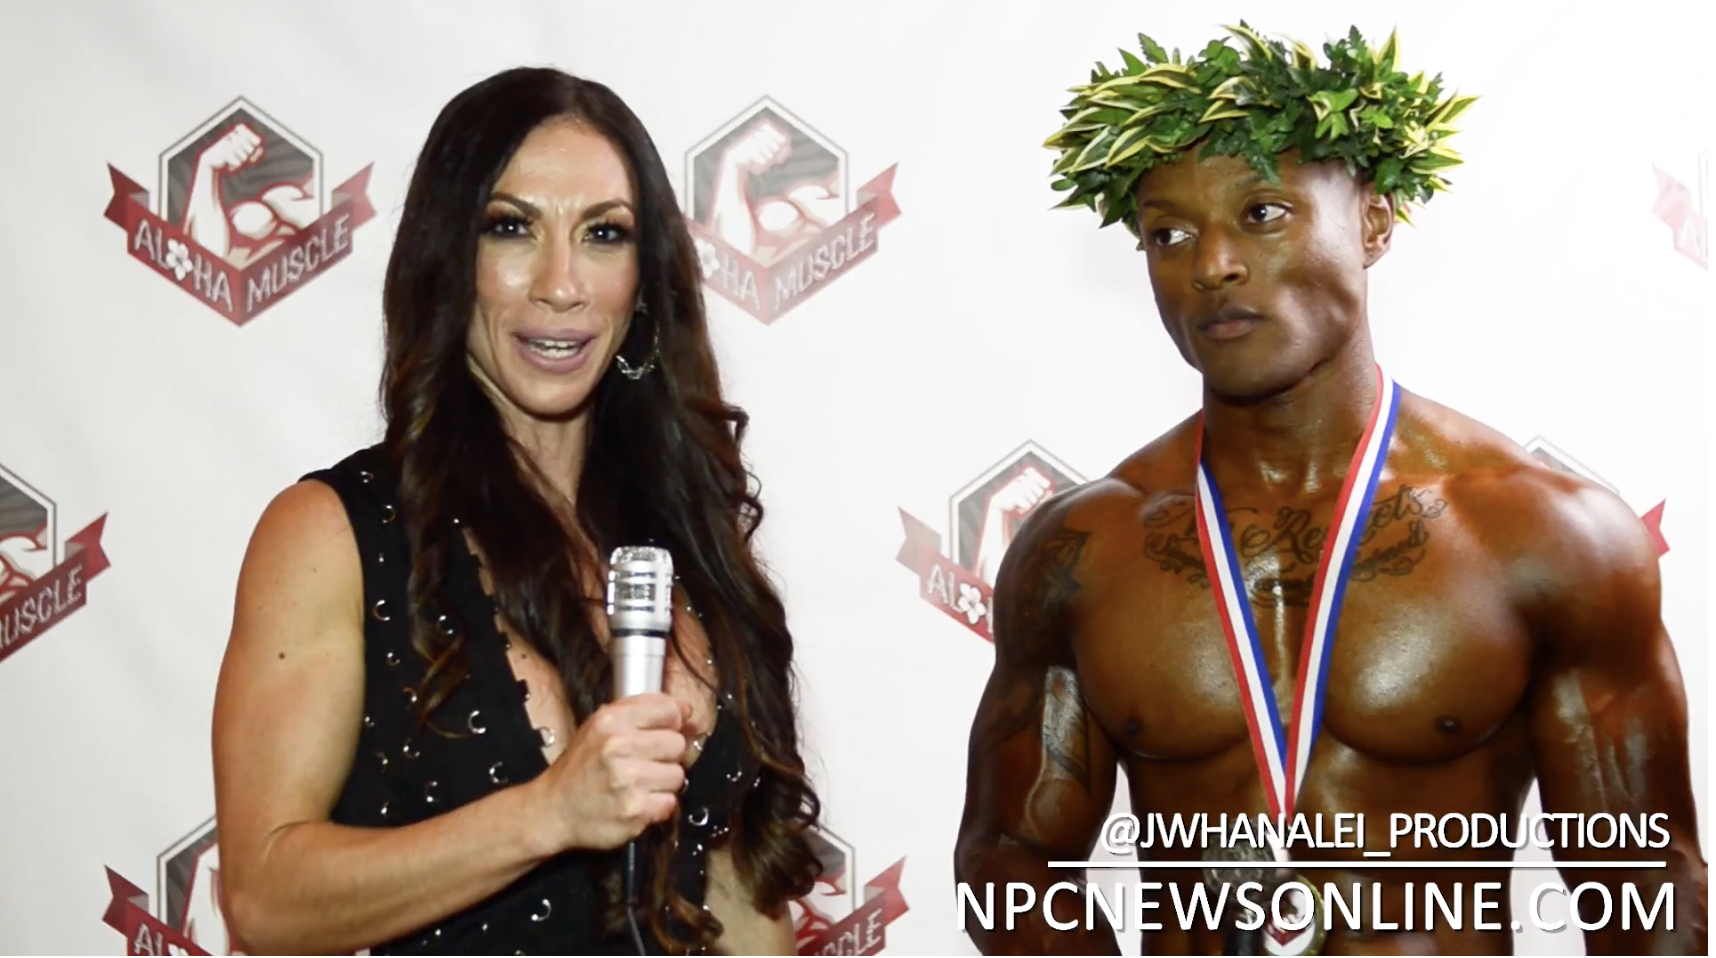 2017 NPC Aloha Muscle Classic Physique Overall Winner Jayson Singleton